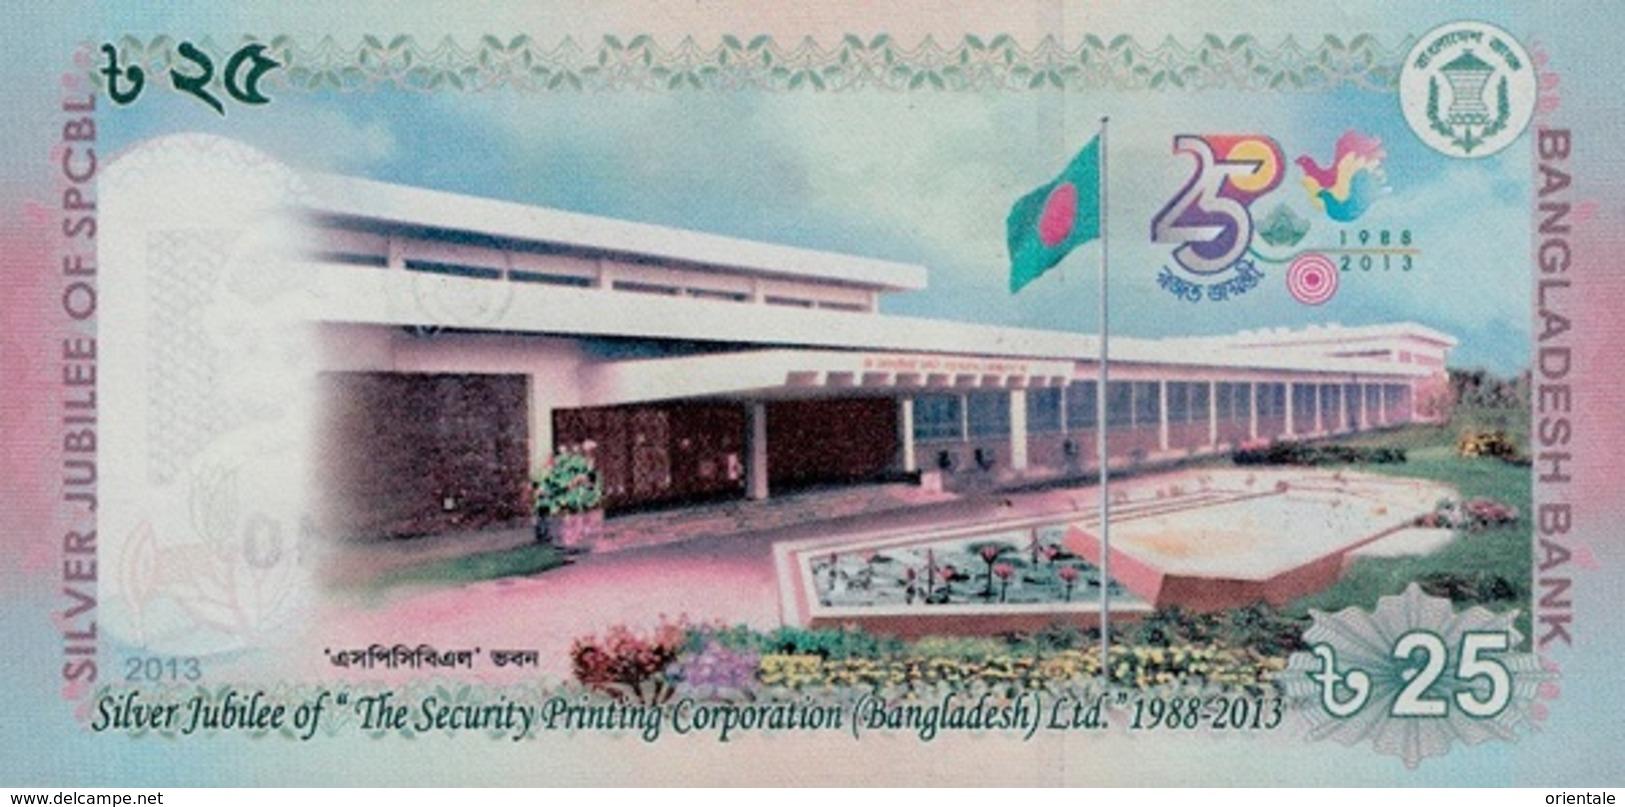 BANGLADESH P. 62 25 T 2013 UNC - Bangladesh